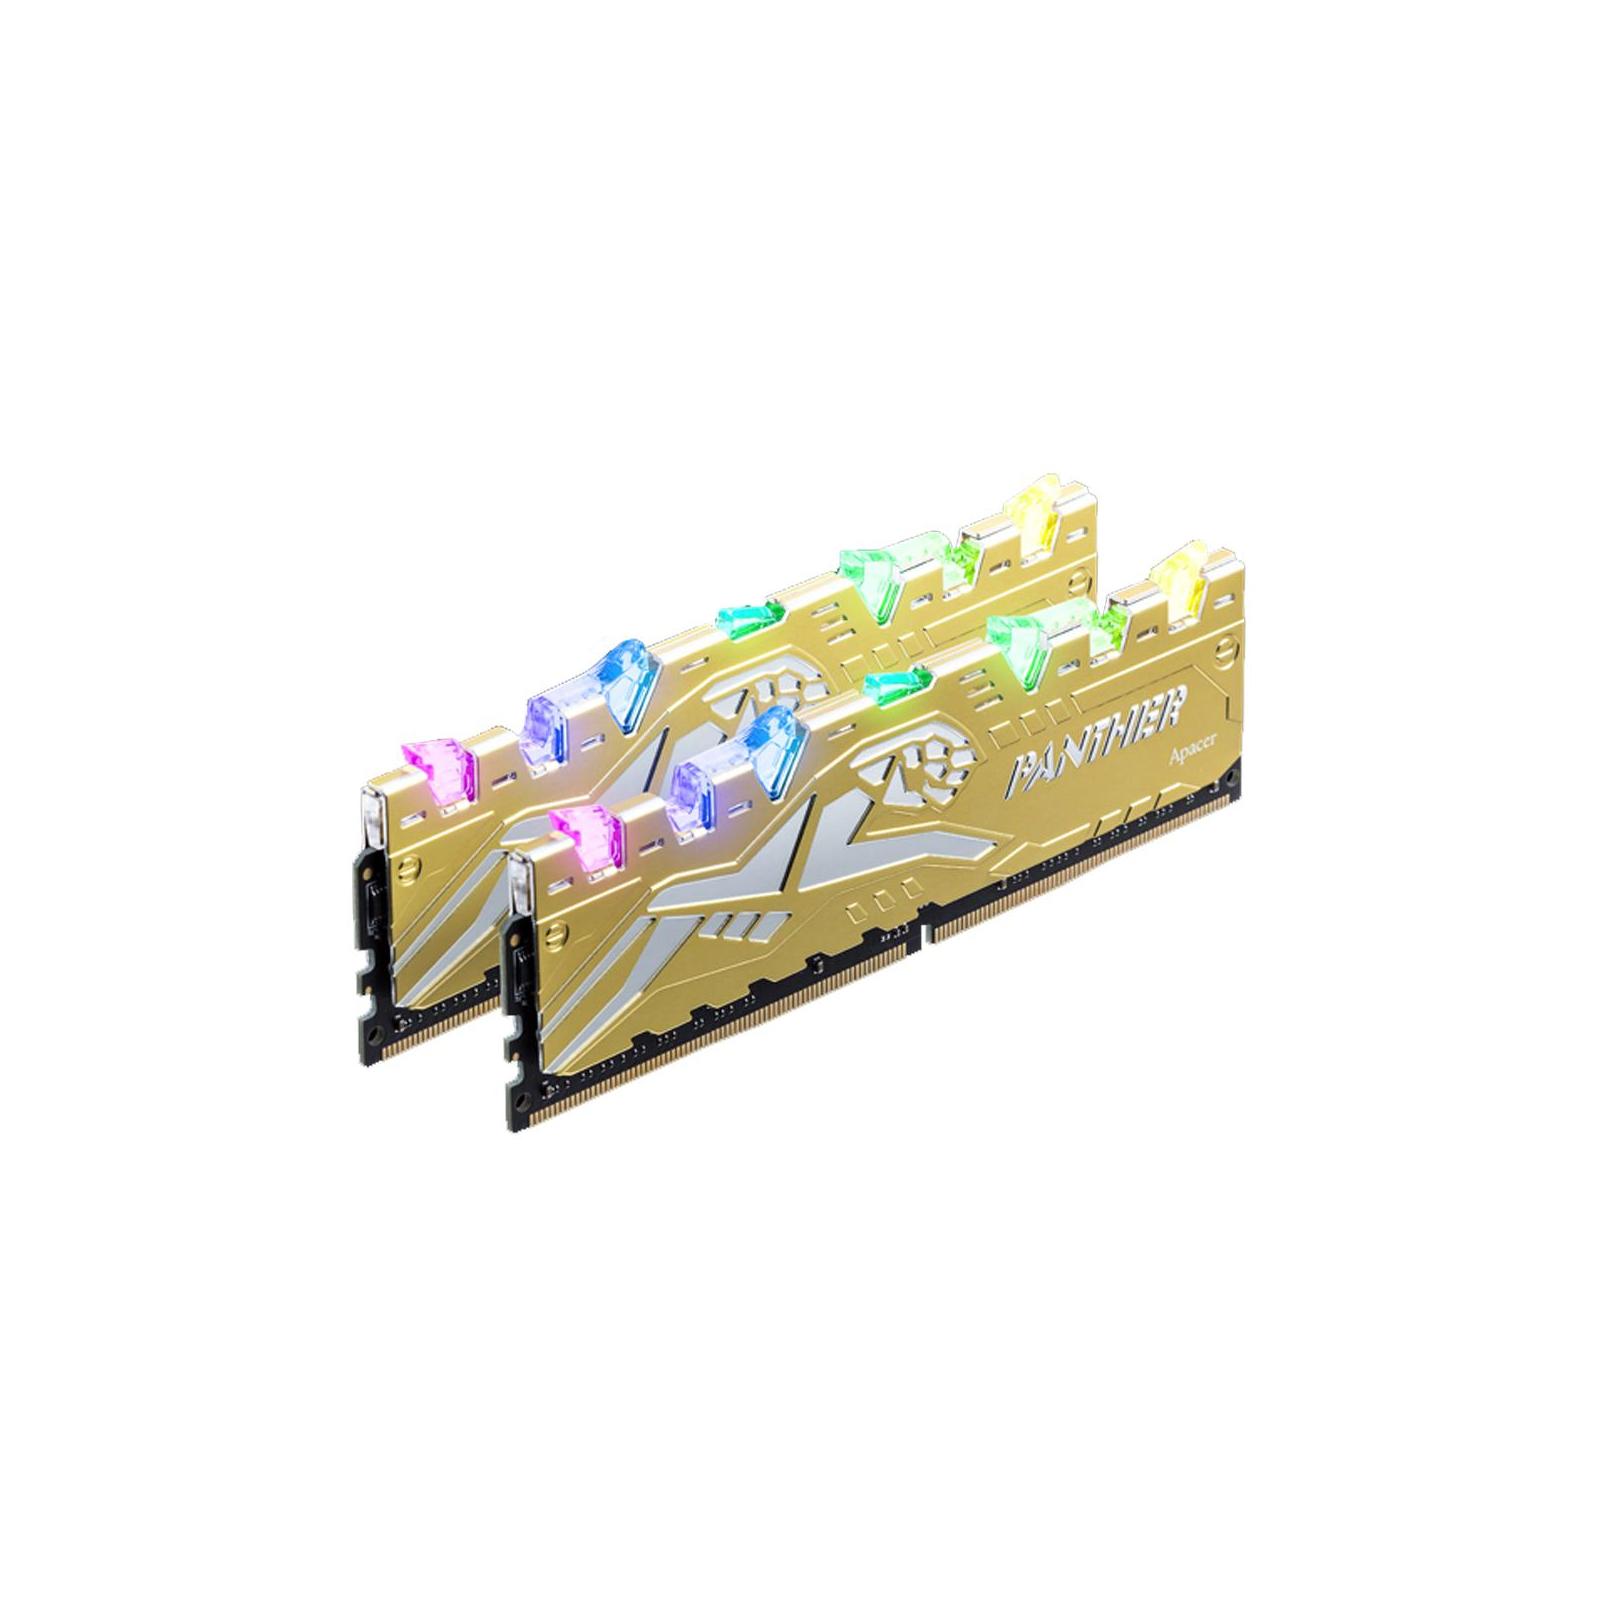 Модуль памяти для компьютера DDR4 16GB (2x8GB) 3000 MHz Panther Rage RGB Silver-Golden Apacer (K.16G2Z.GJMK2) изображение 2